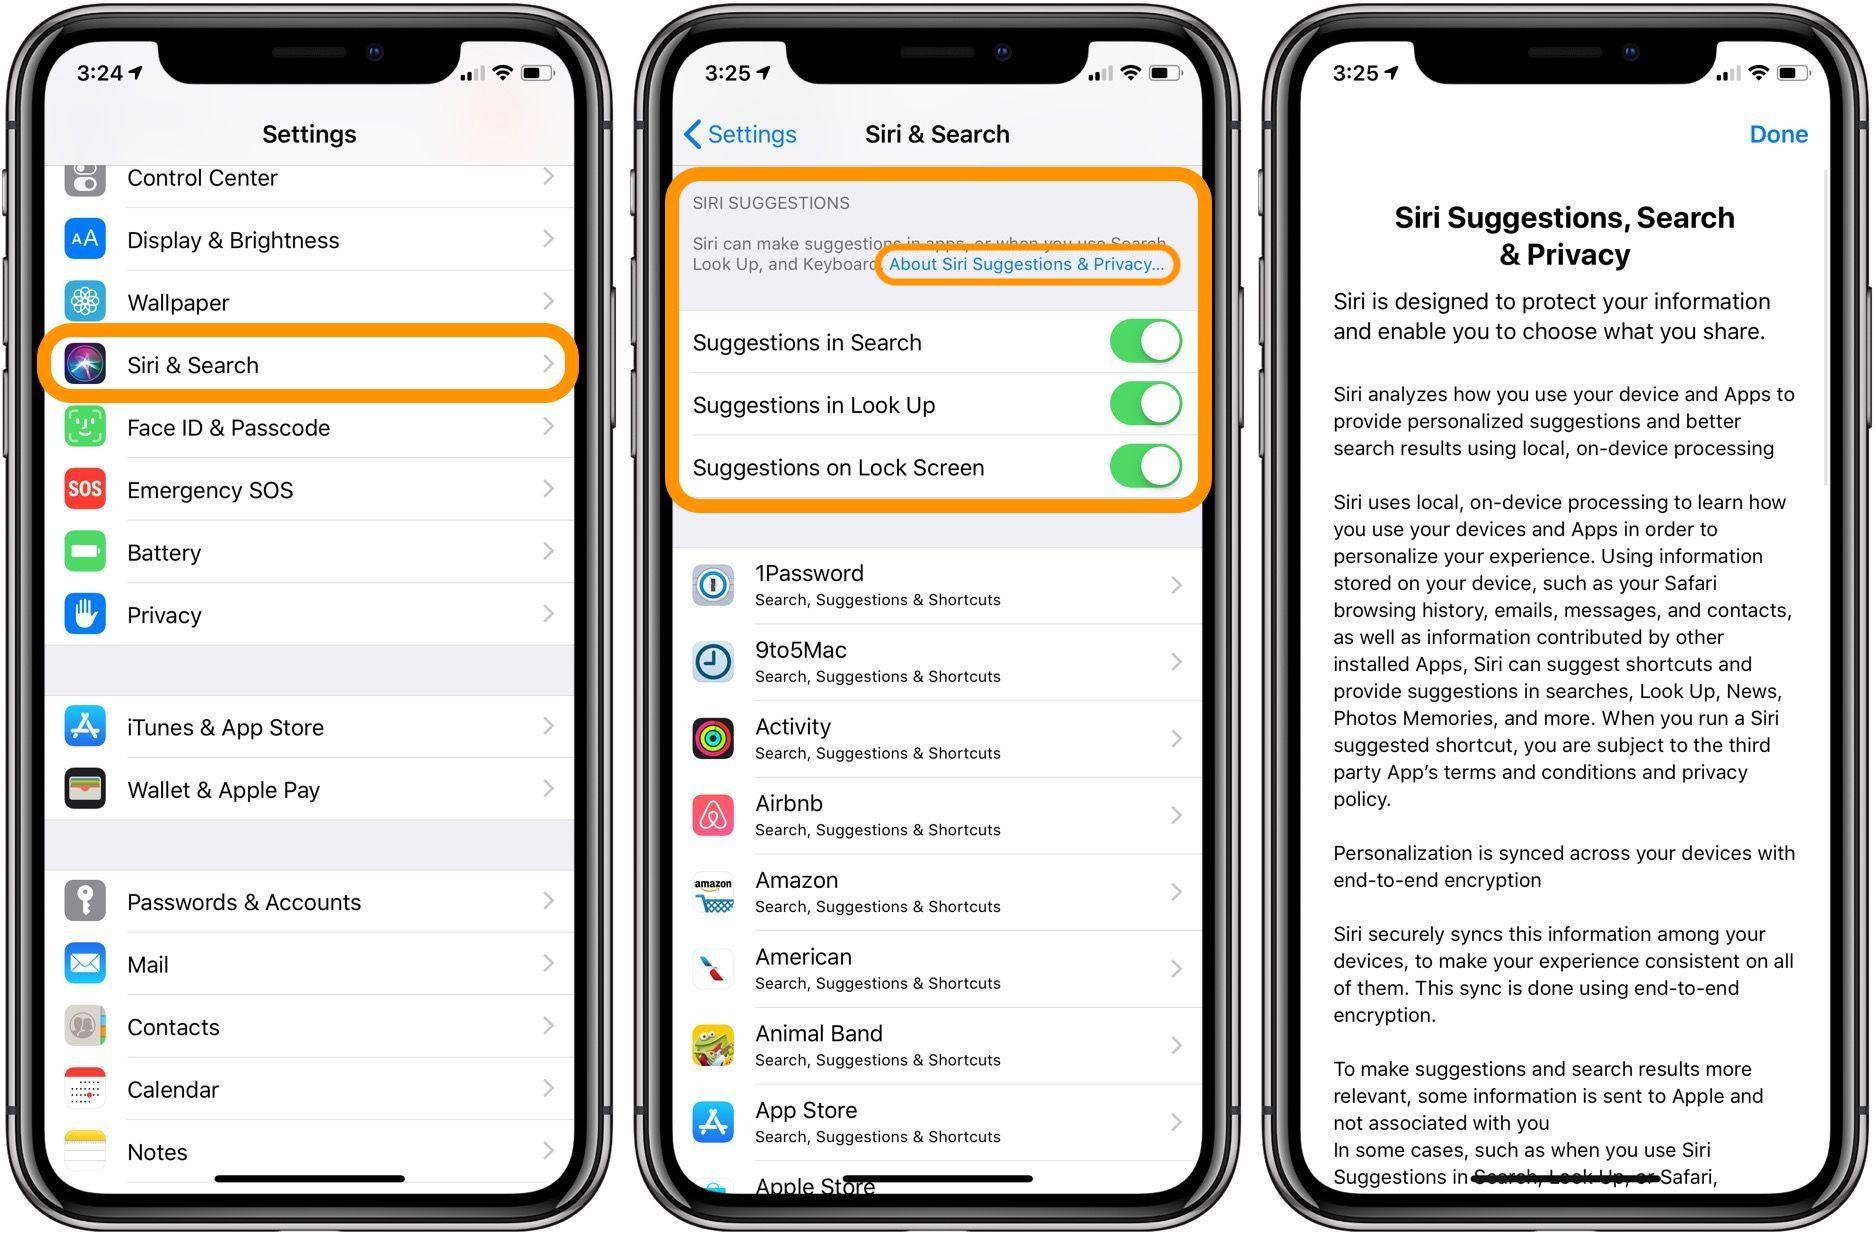 "<span href=""https://9to5mac.com/2018/08/13/iphone-ipad-how-to-customize-siri-suggestions/"">iPhone & iPad: Cómo personalizar Siri sugerencias</a>"